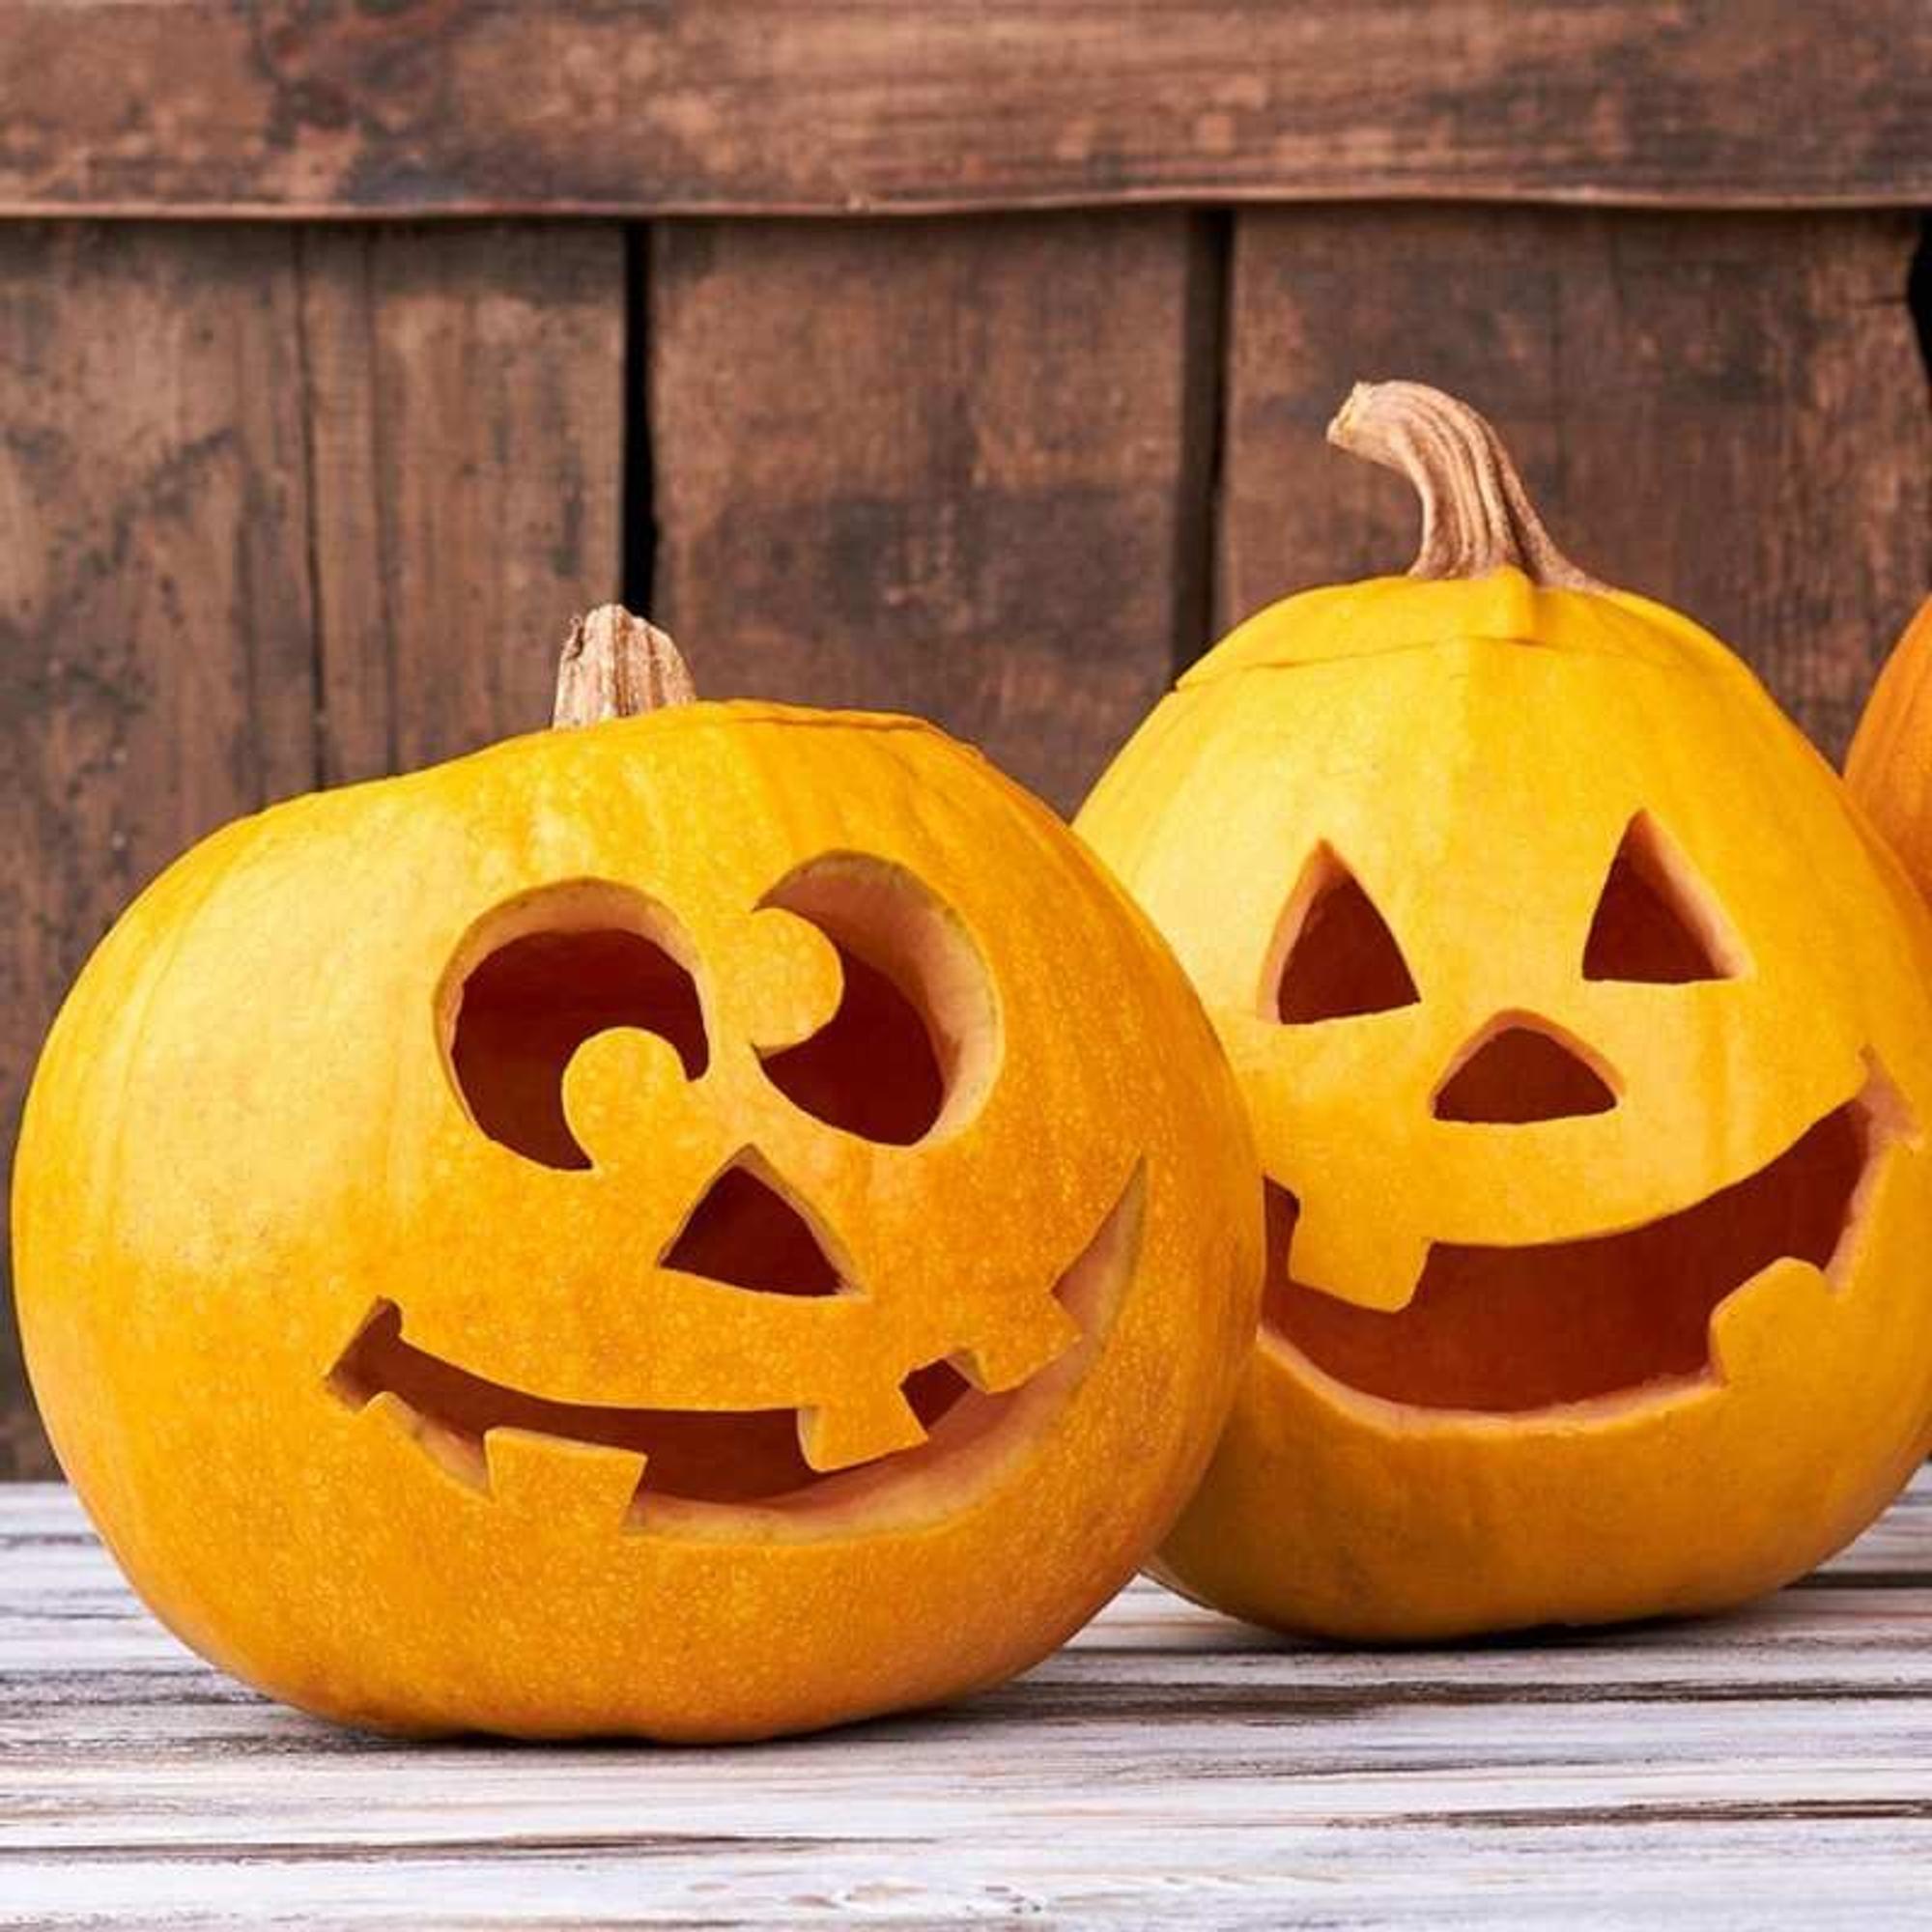 Kürbisse als Halloween-Deko vor der Tür